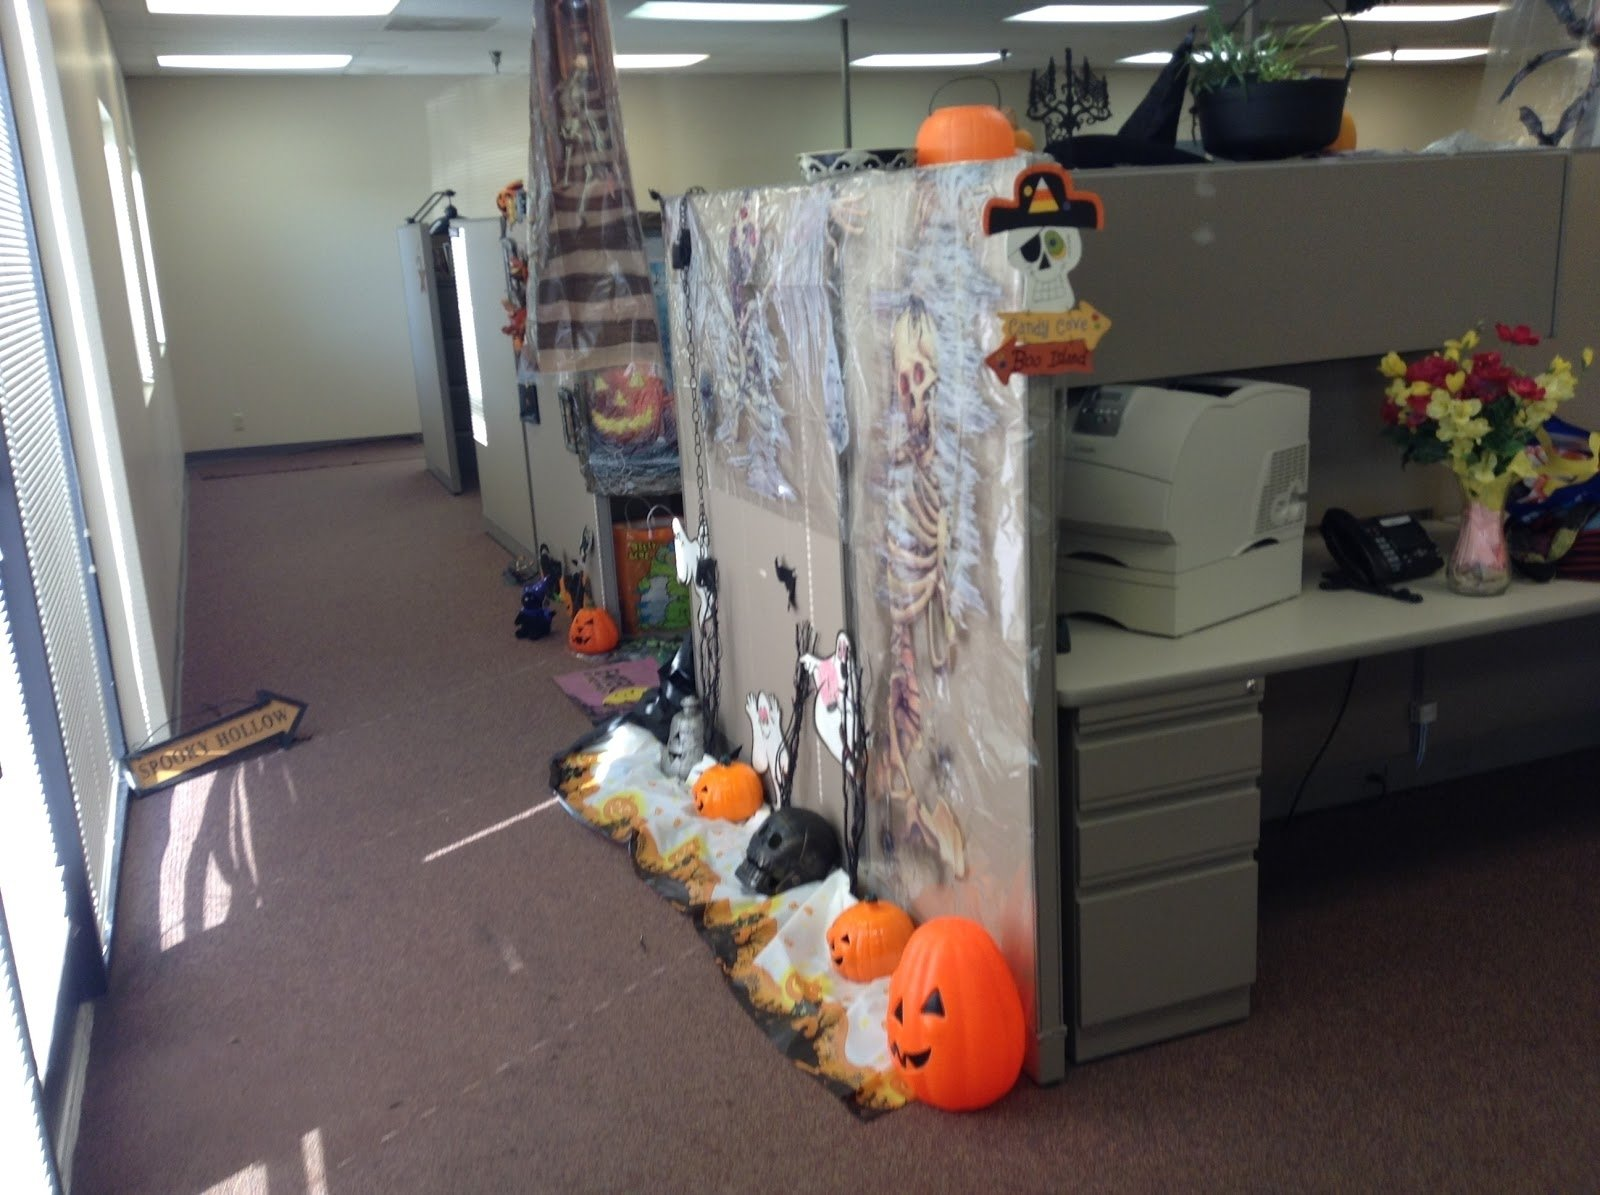 10 Pretty Halloween Ideas For The Office office halloween costume ideas spooky decorating tierra este 82629 1 2020